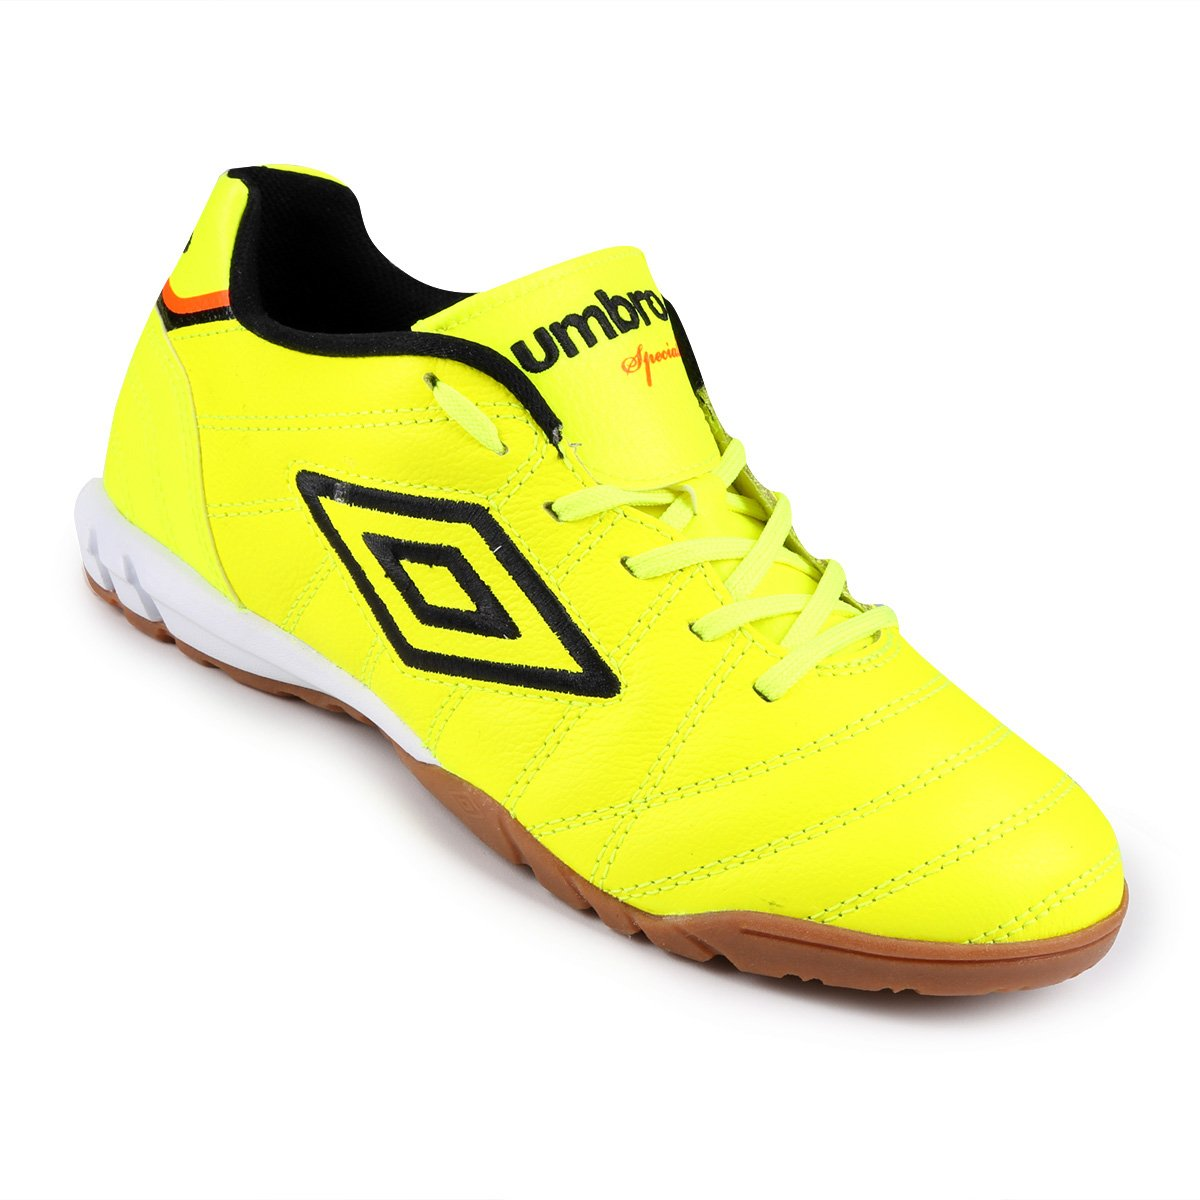 Chuteira Futsal Umbro Speciali Premier Masculina - Compre Agora ... 6e2f51a75596d